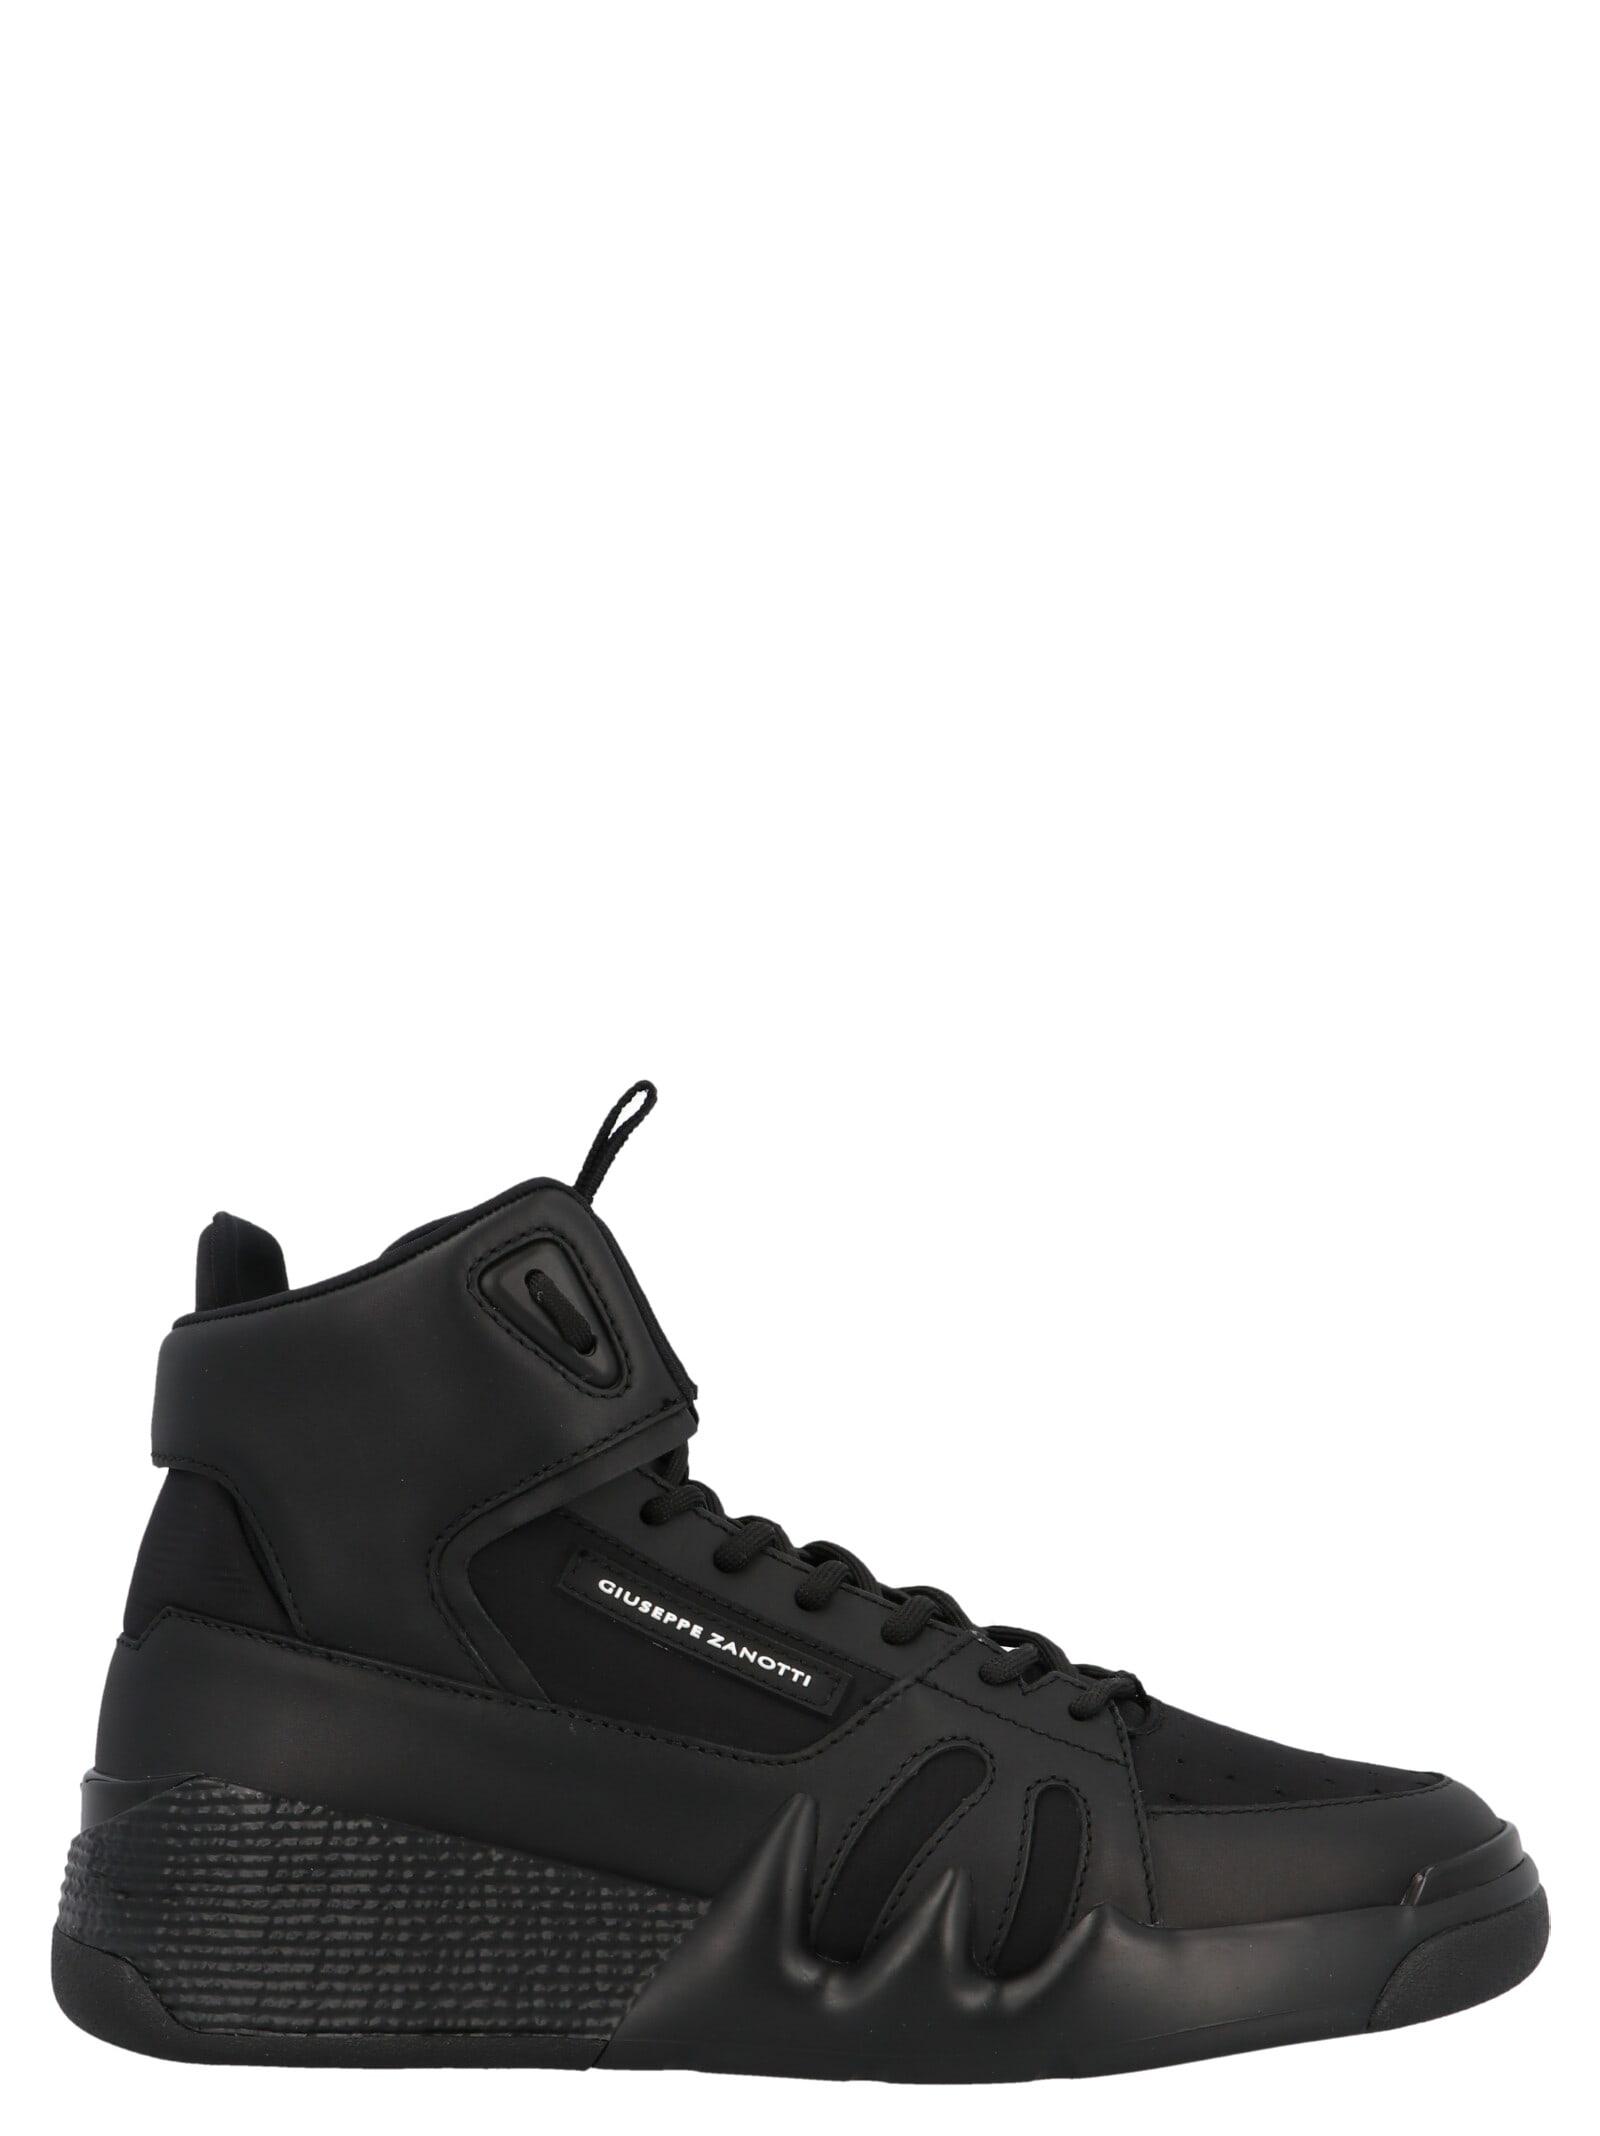 Giuseppe Zanotti talon Shoes